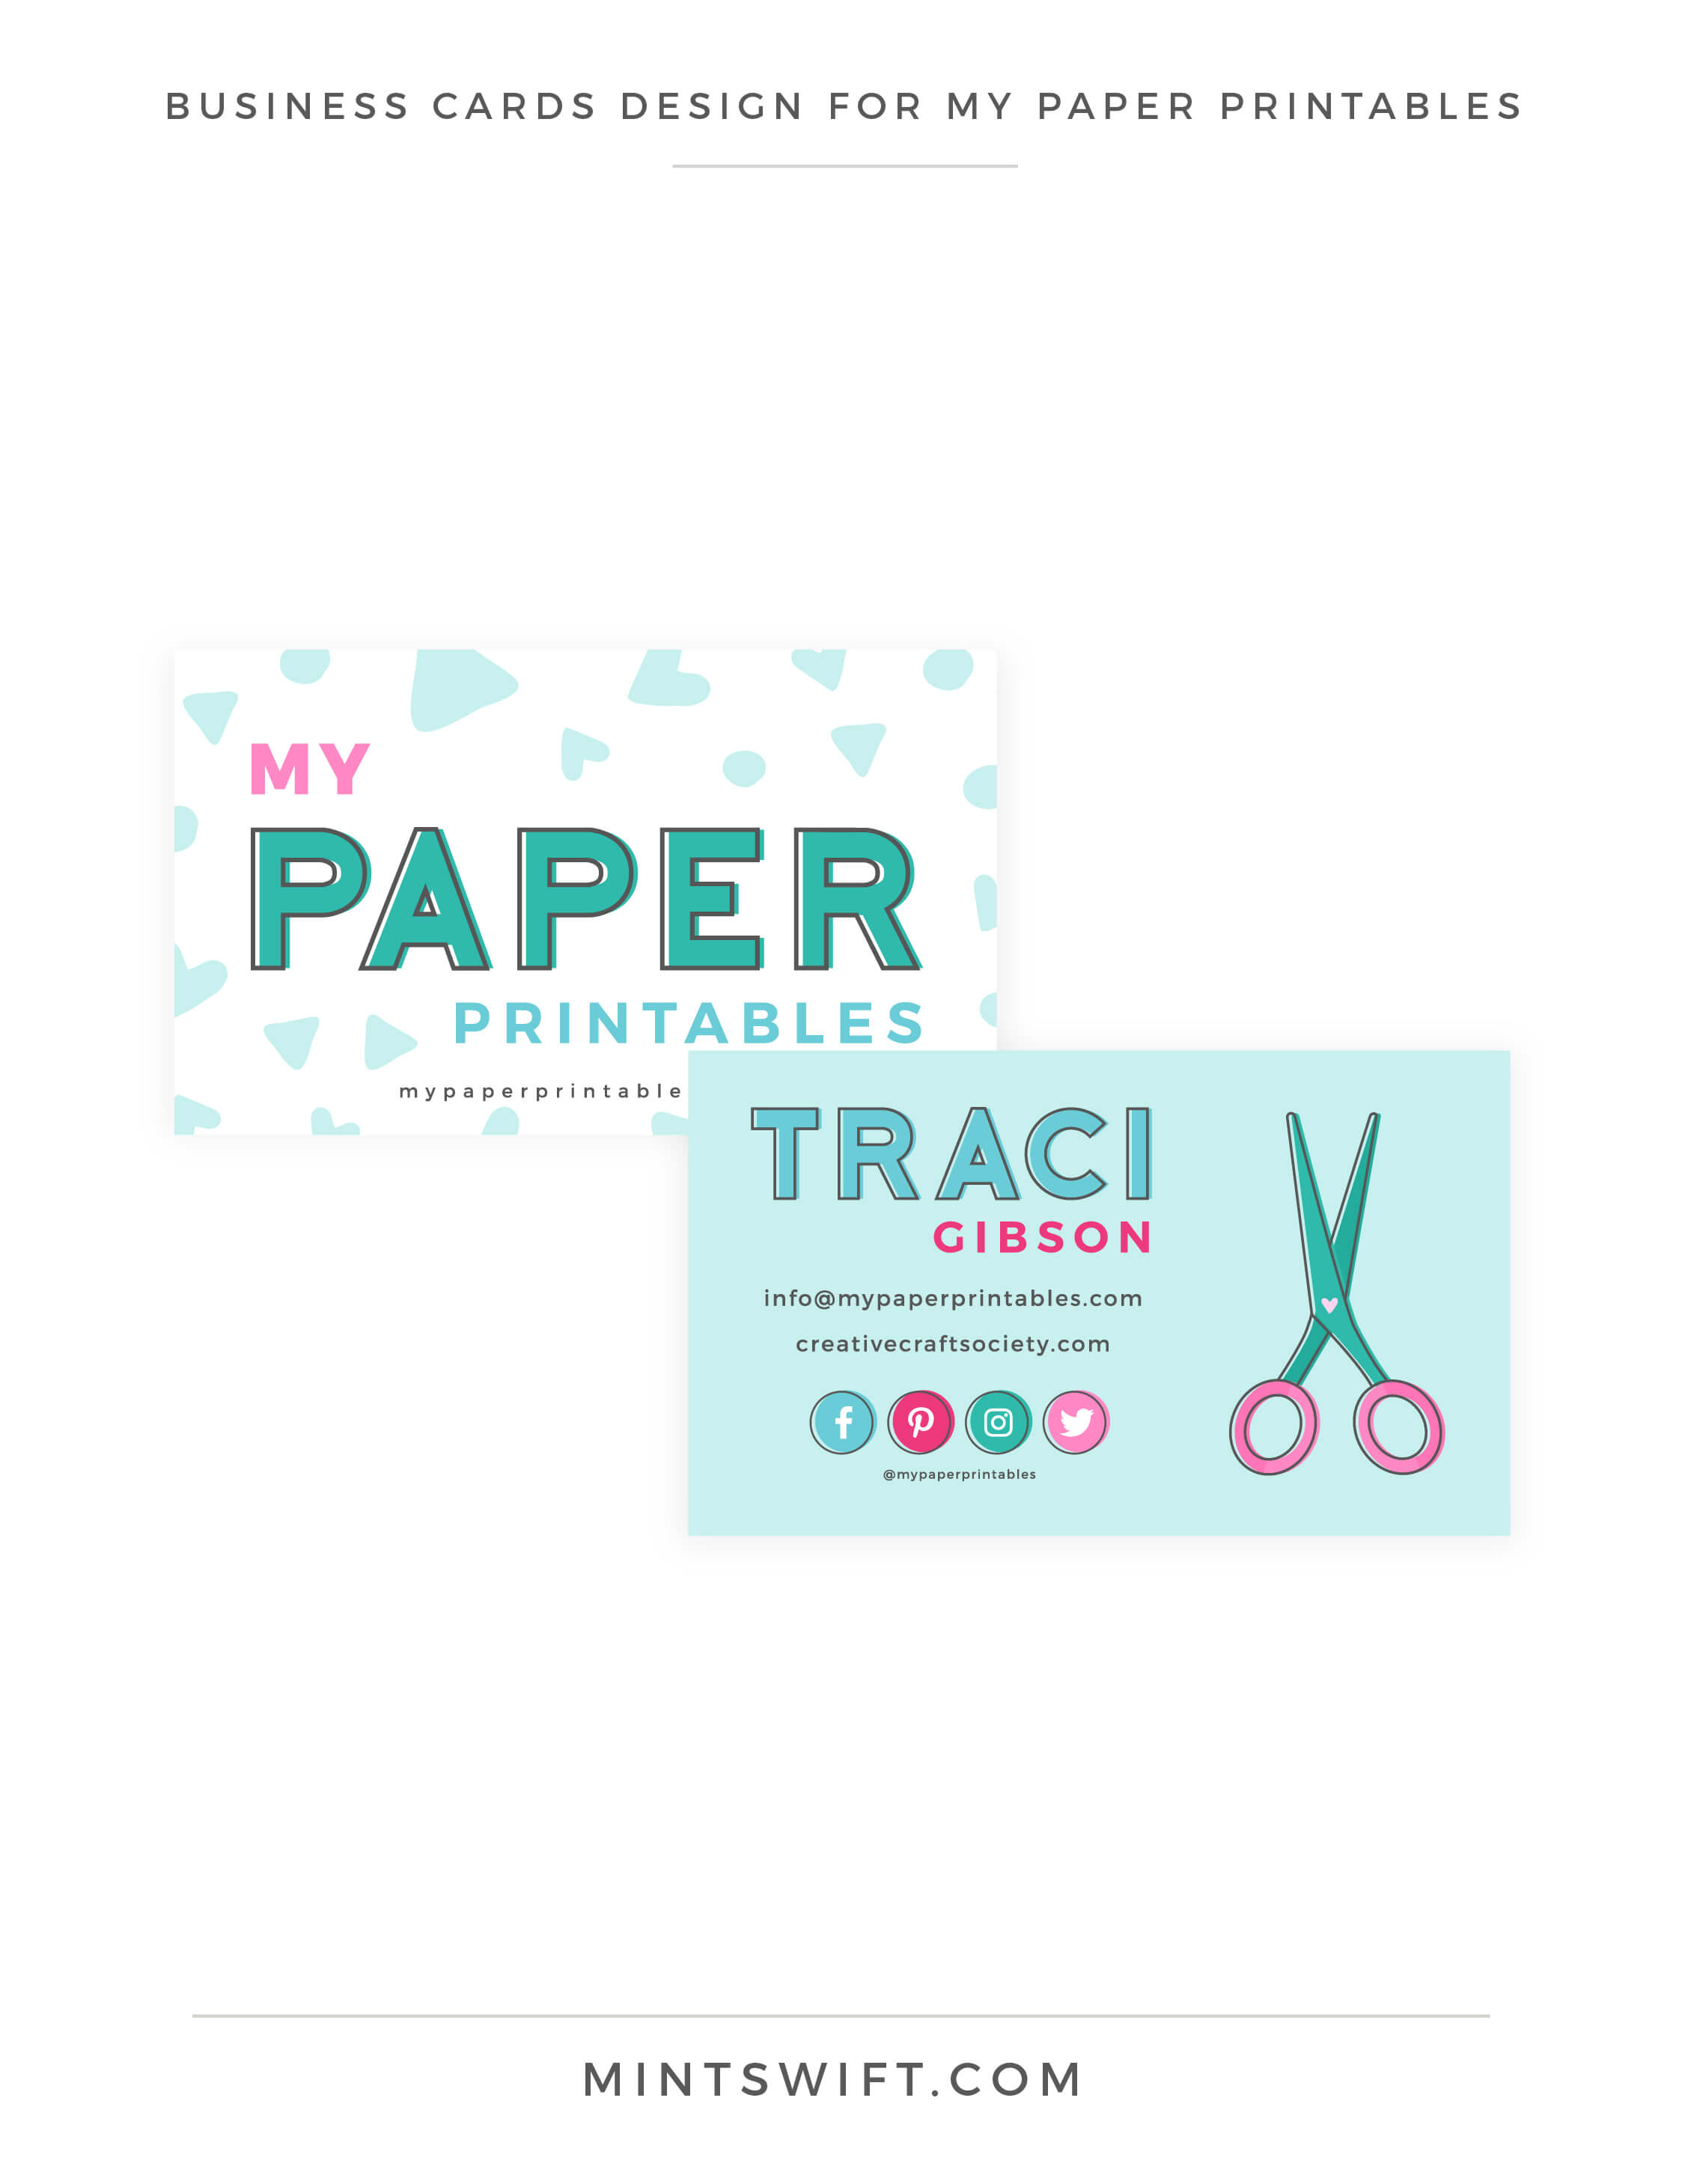 My Paper Printables - Business Cards Design - Brand Design - MintSwift